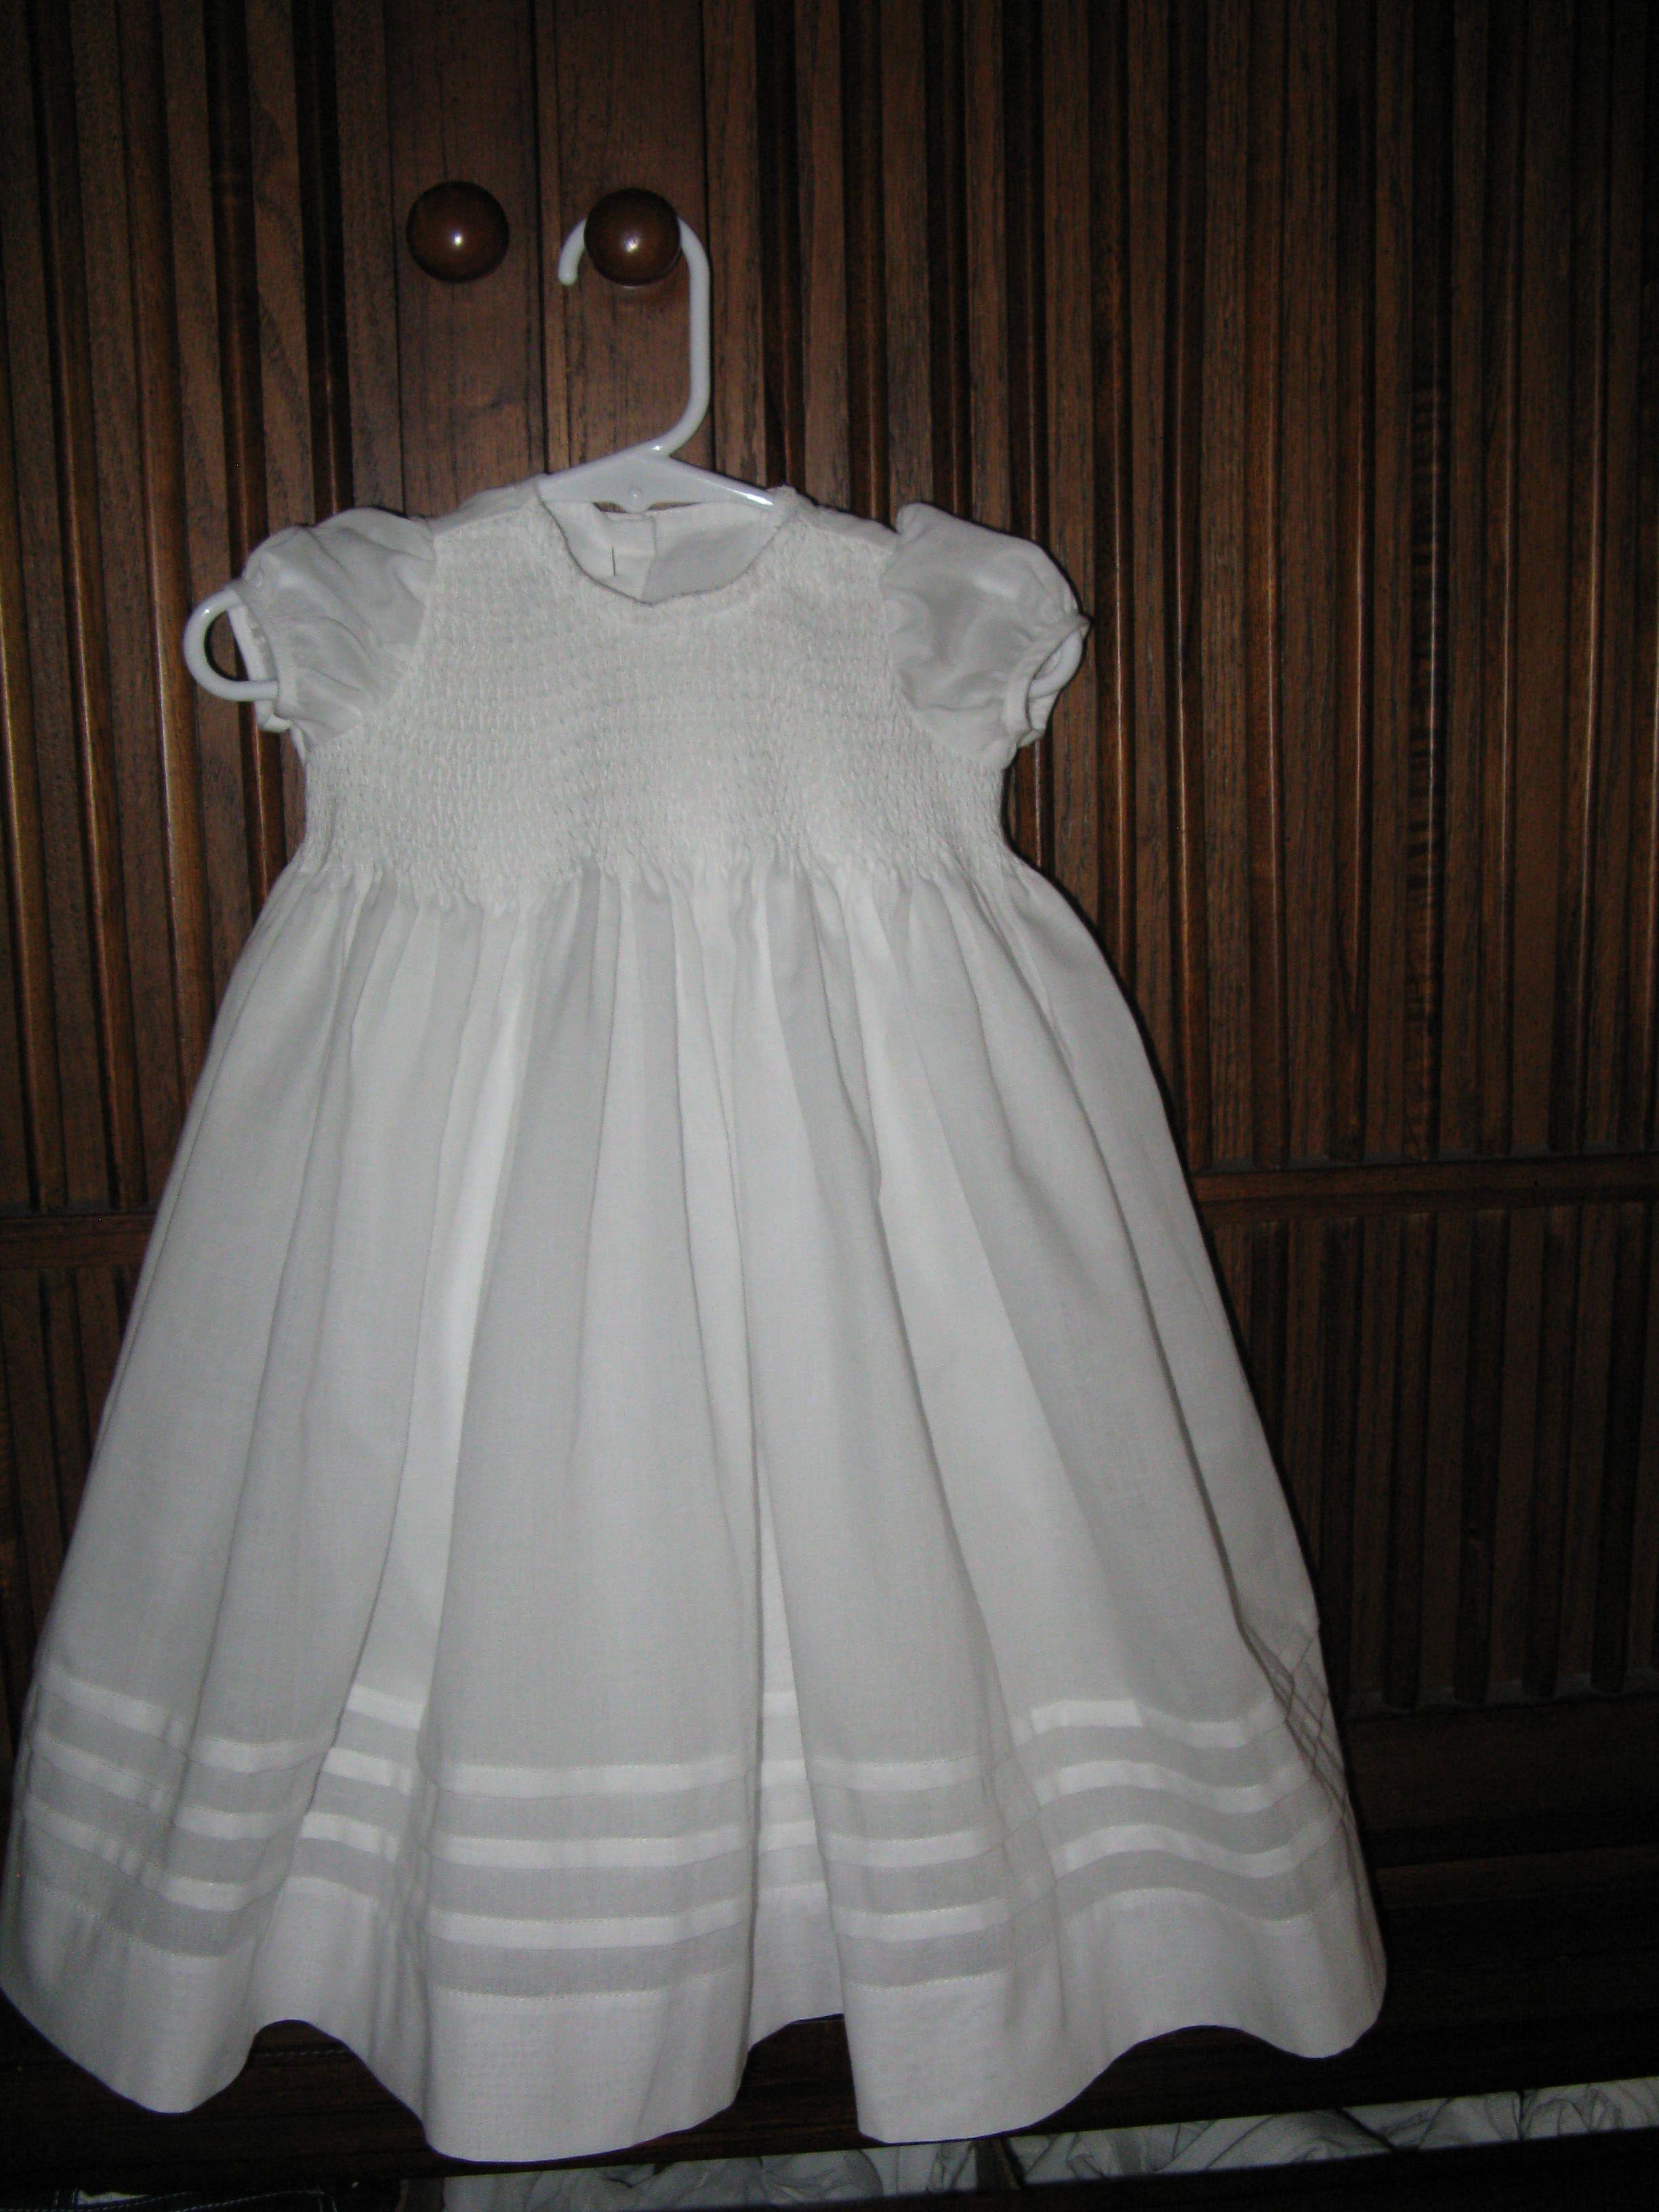 The blessing dress I made for Samantha Rae Maynes